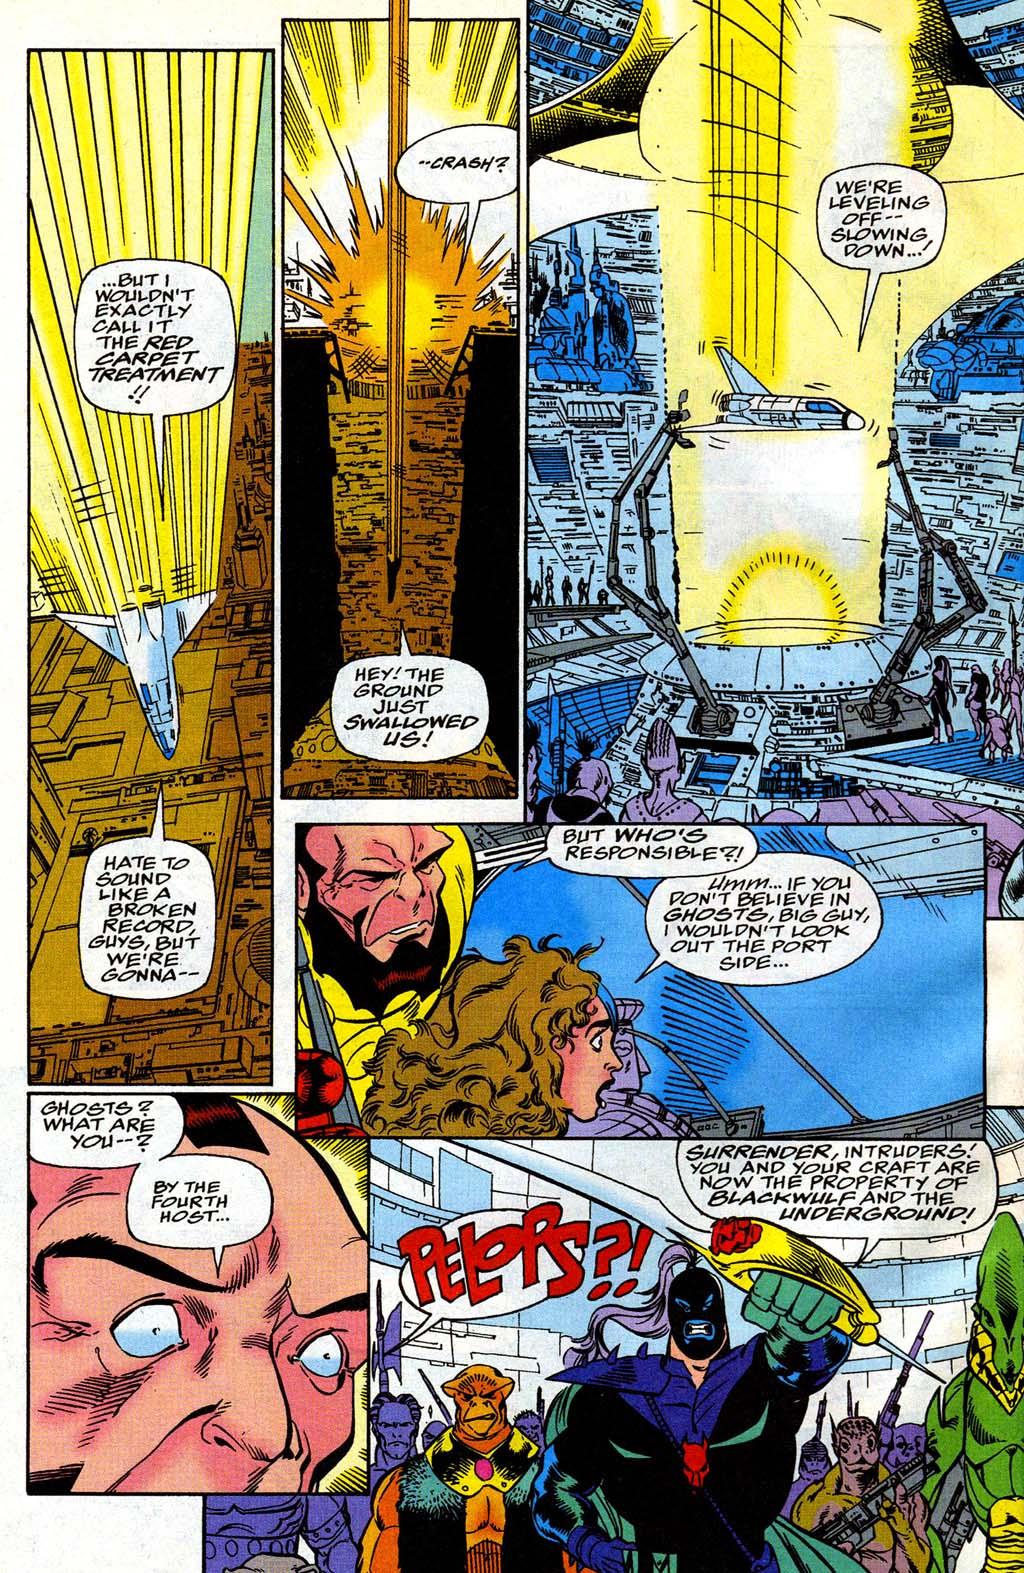 Read online Blackwulf comic -  Issue #8 - 10